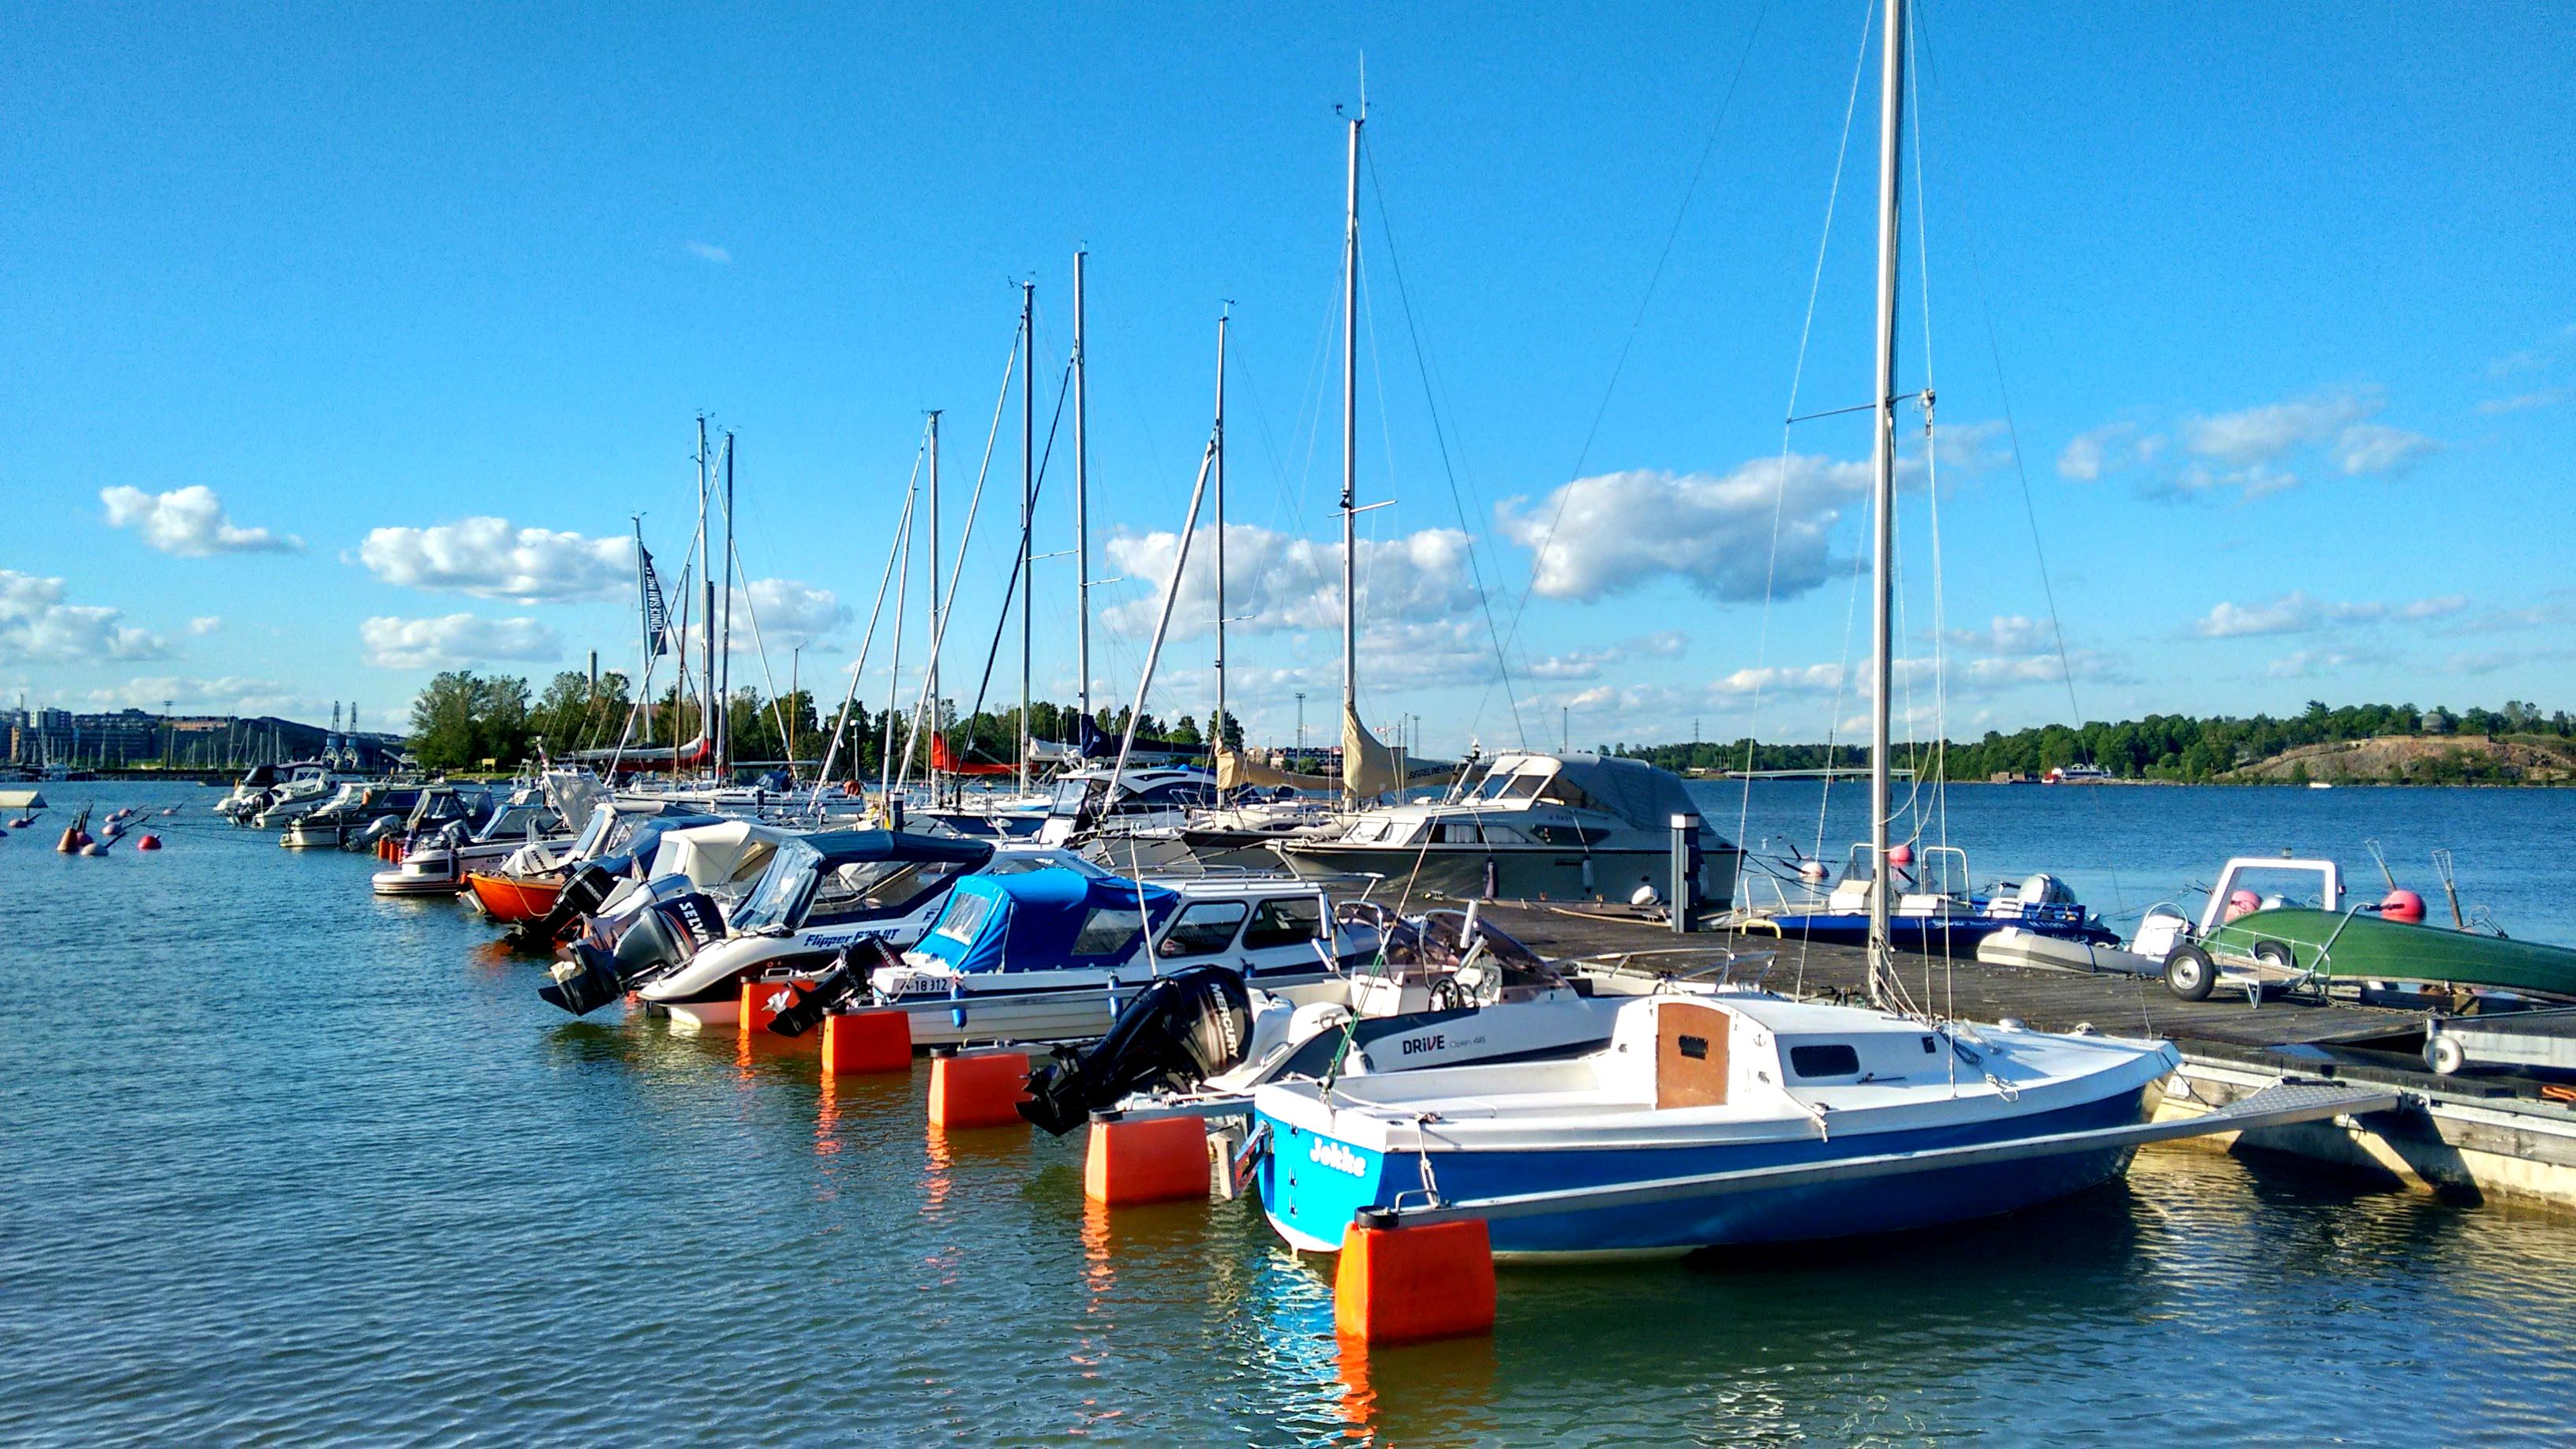 Private dock area, Helsinki